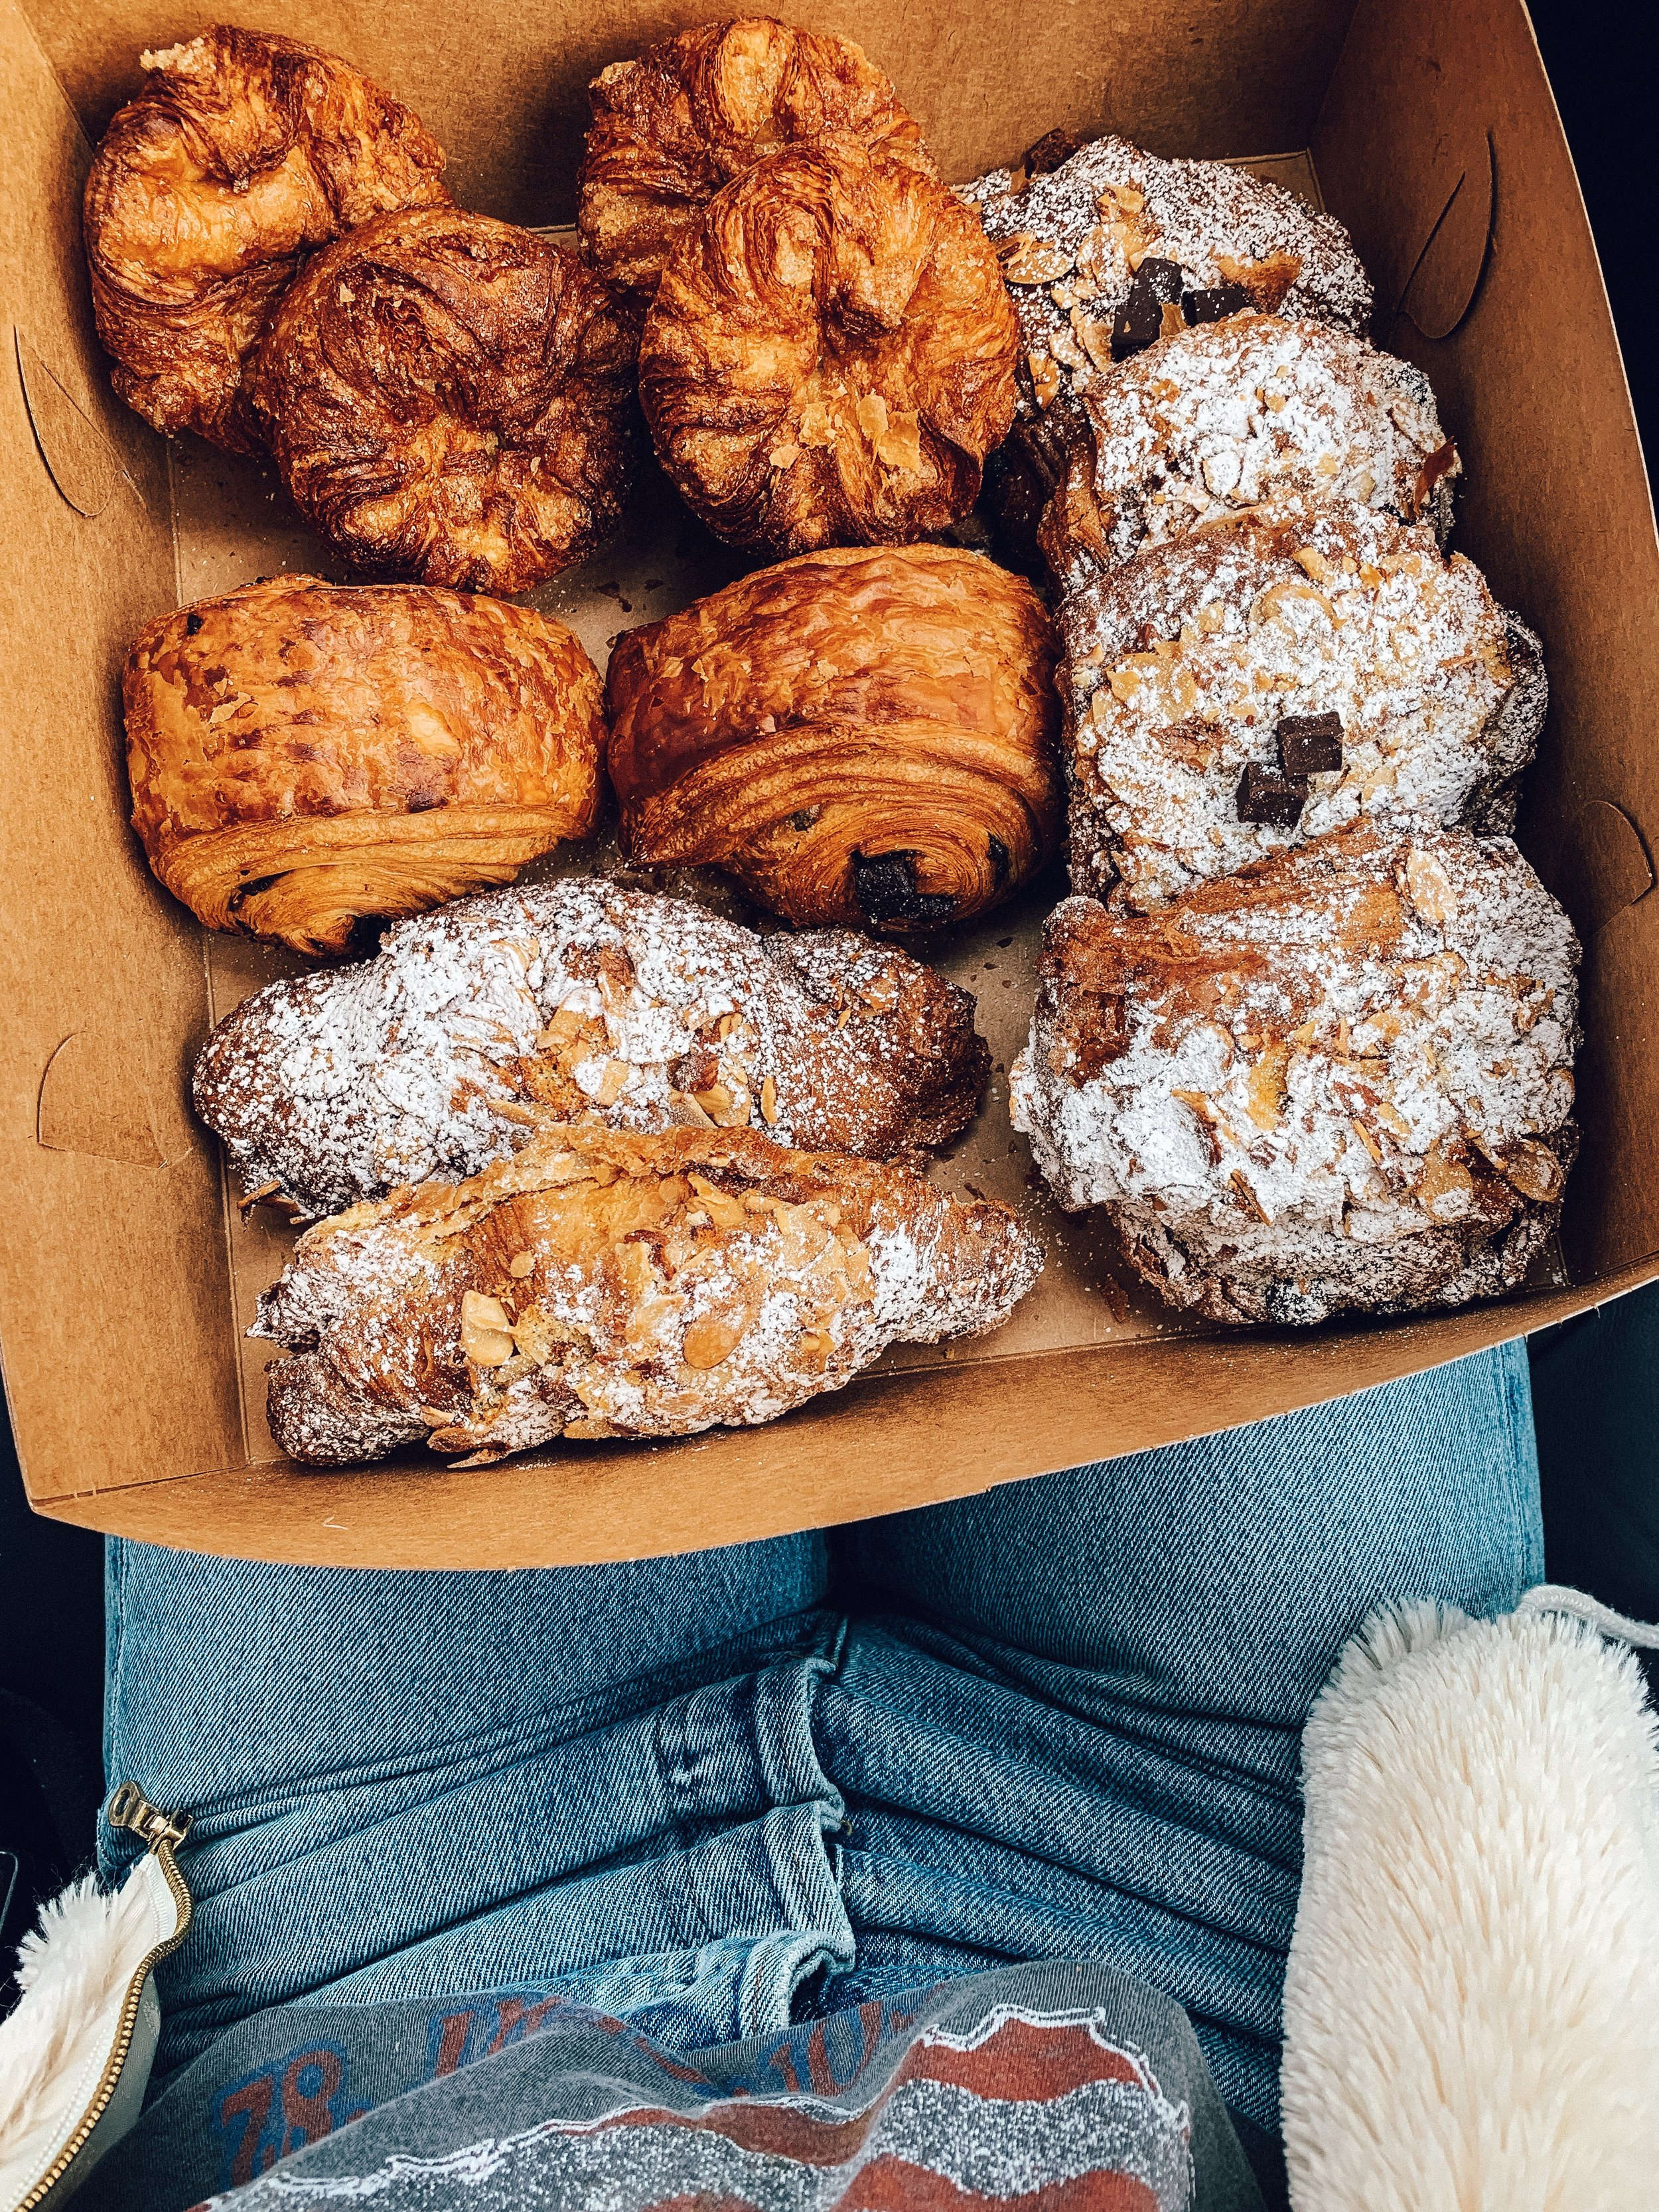 Nathaniel Reid Bakery - kouign-amann (pronounced like queen), chocolate croissants, almond croissants, chocolate almond croissants.